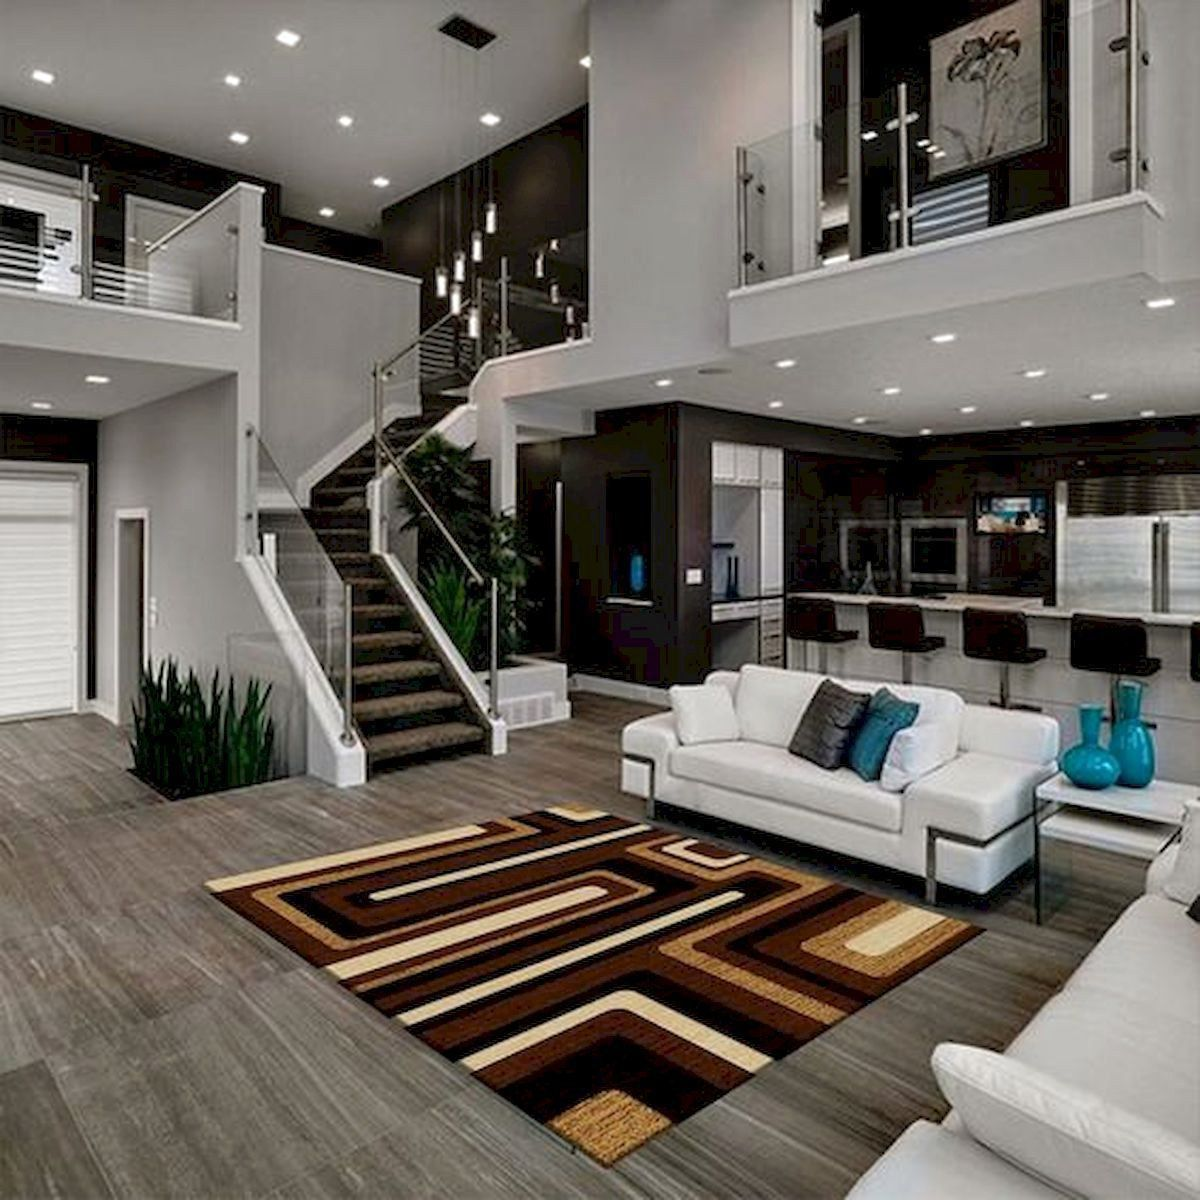 90 Best Living Room Decor Ideas Modern House Design Dream Home Design House Interior